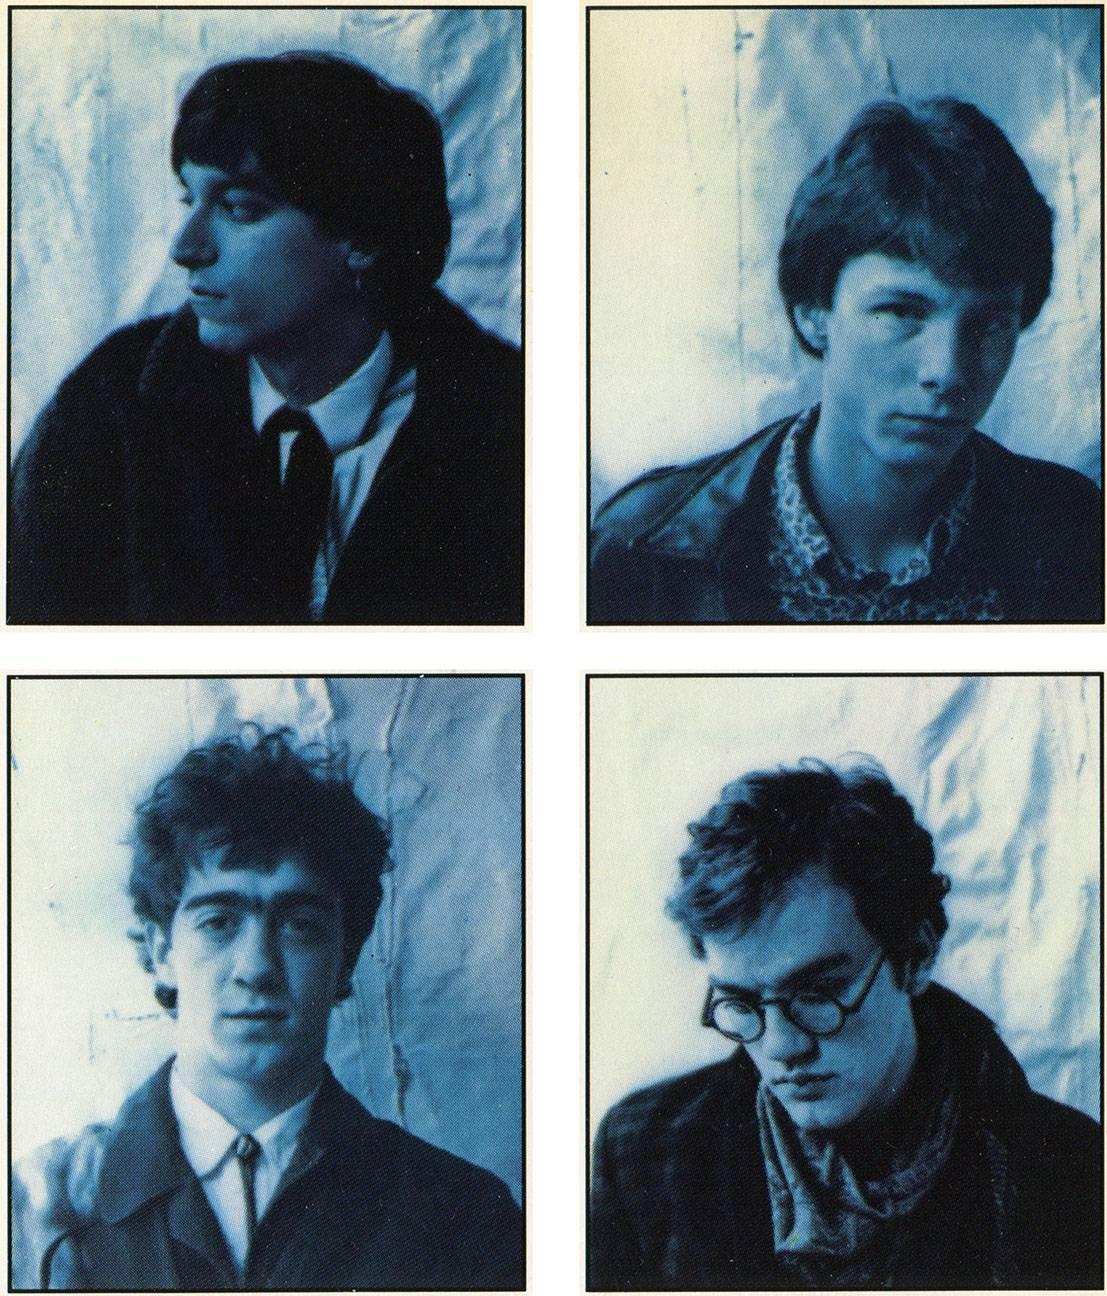 R.E.M. - Murmur (1983) Expanded Reissue 1992